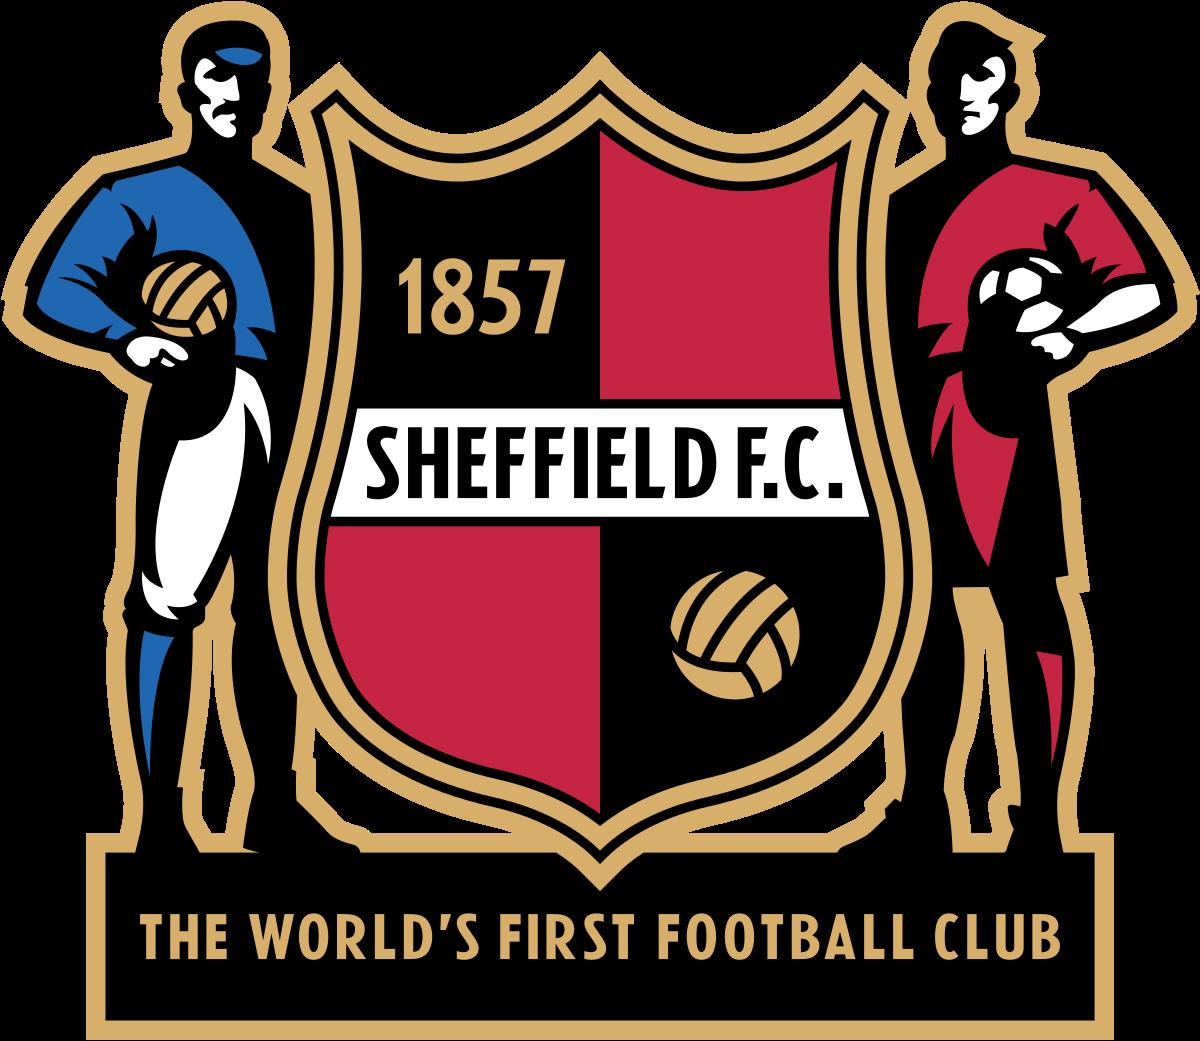 Sheffield FC crest